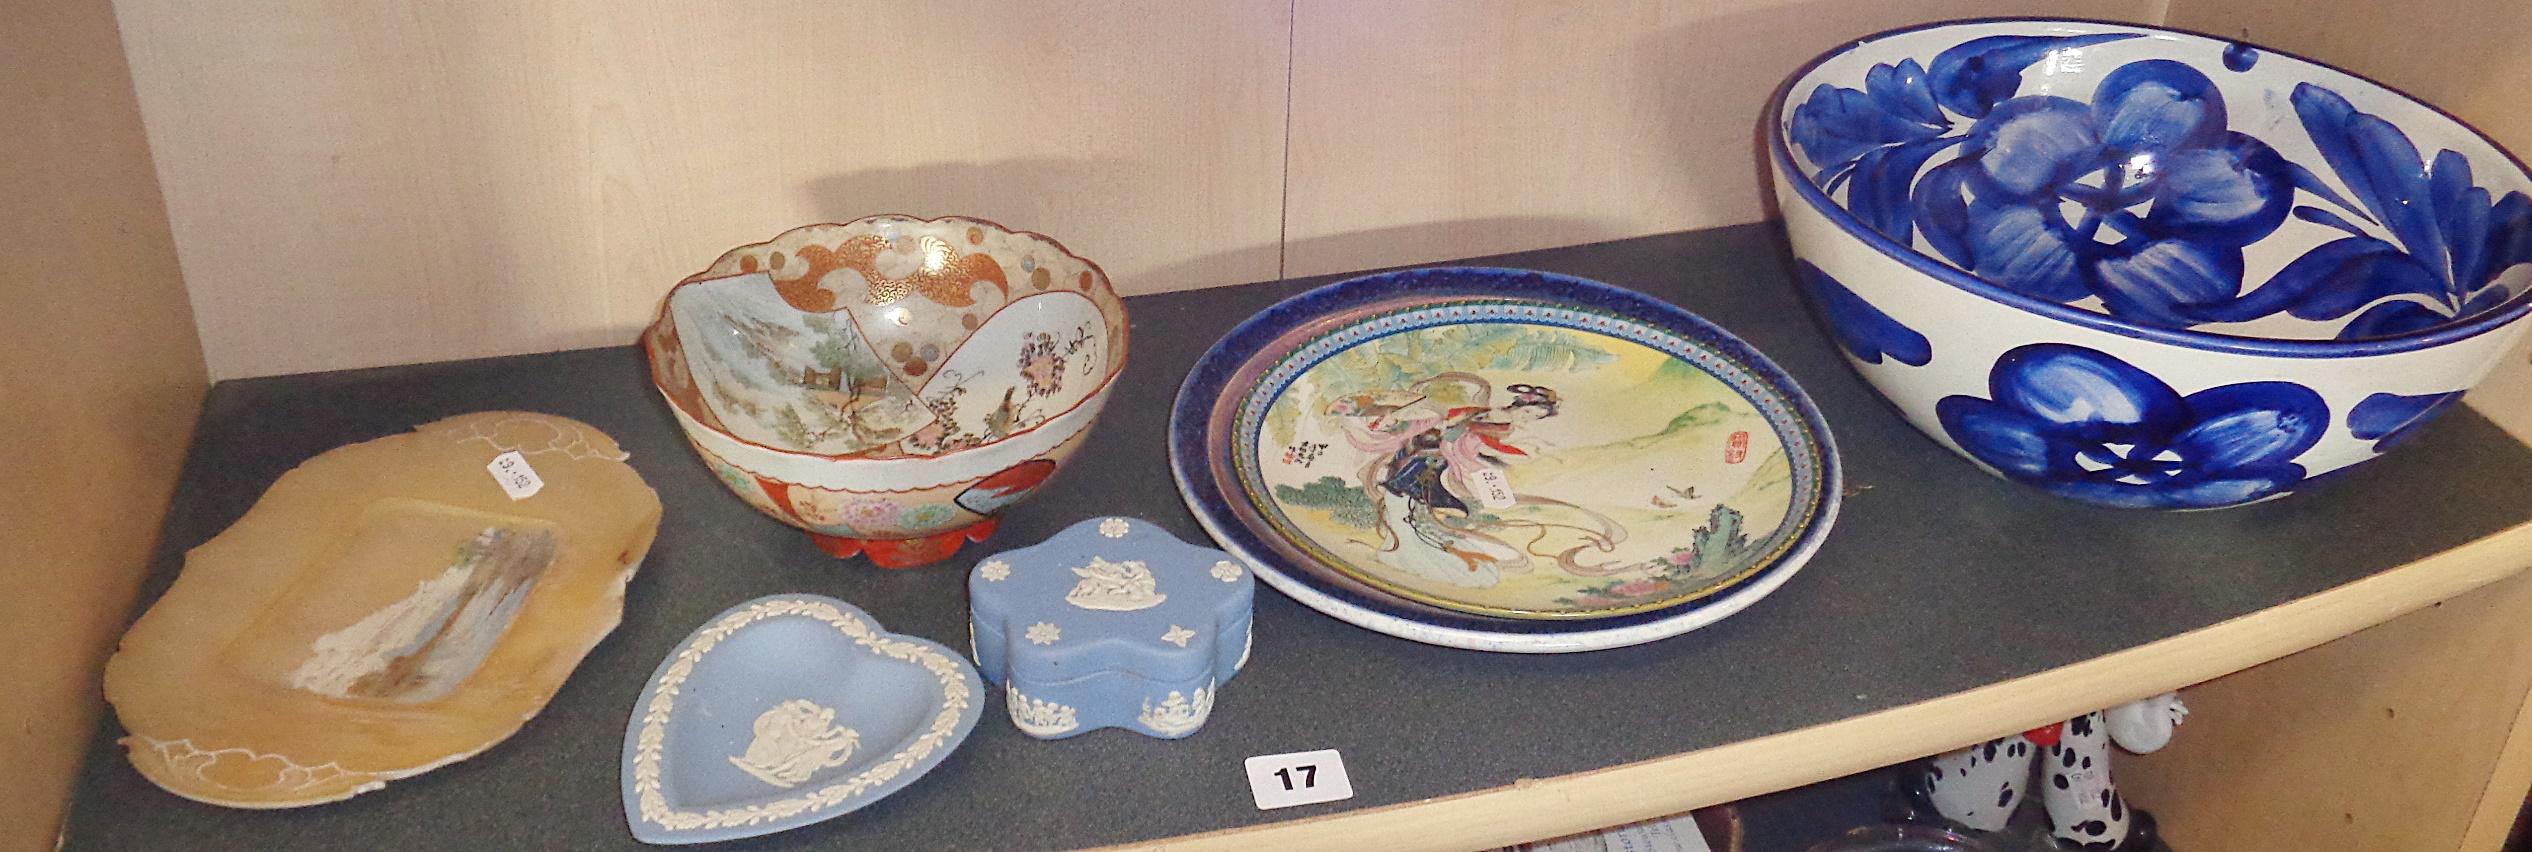 Lot 17 - An Ian Barton studio pottery plate, a Japanese Satsuma bowl and plate etc. (7 pieces)